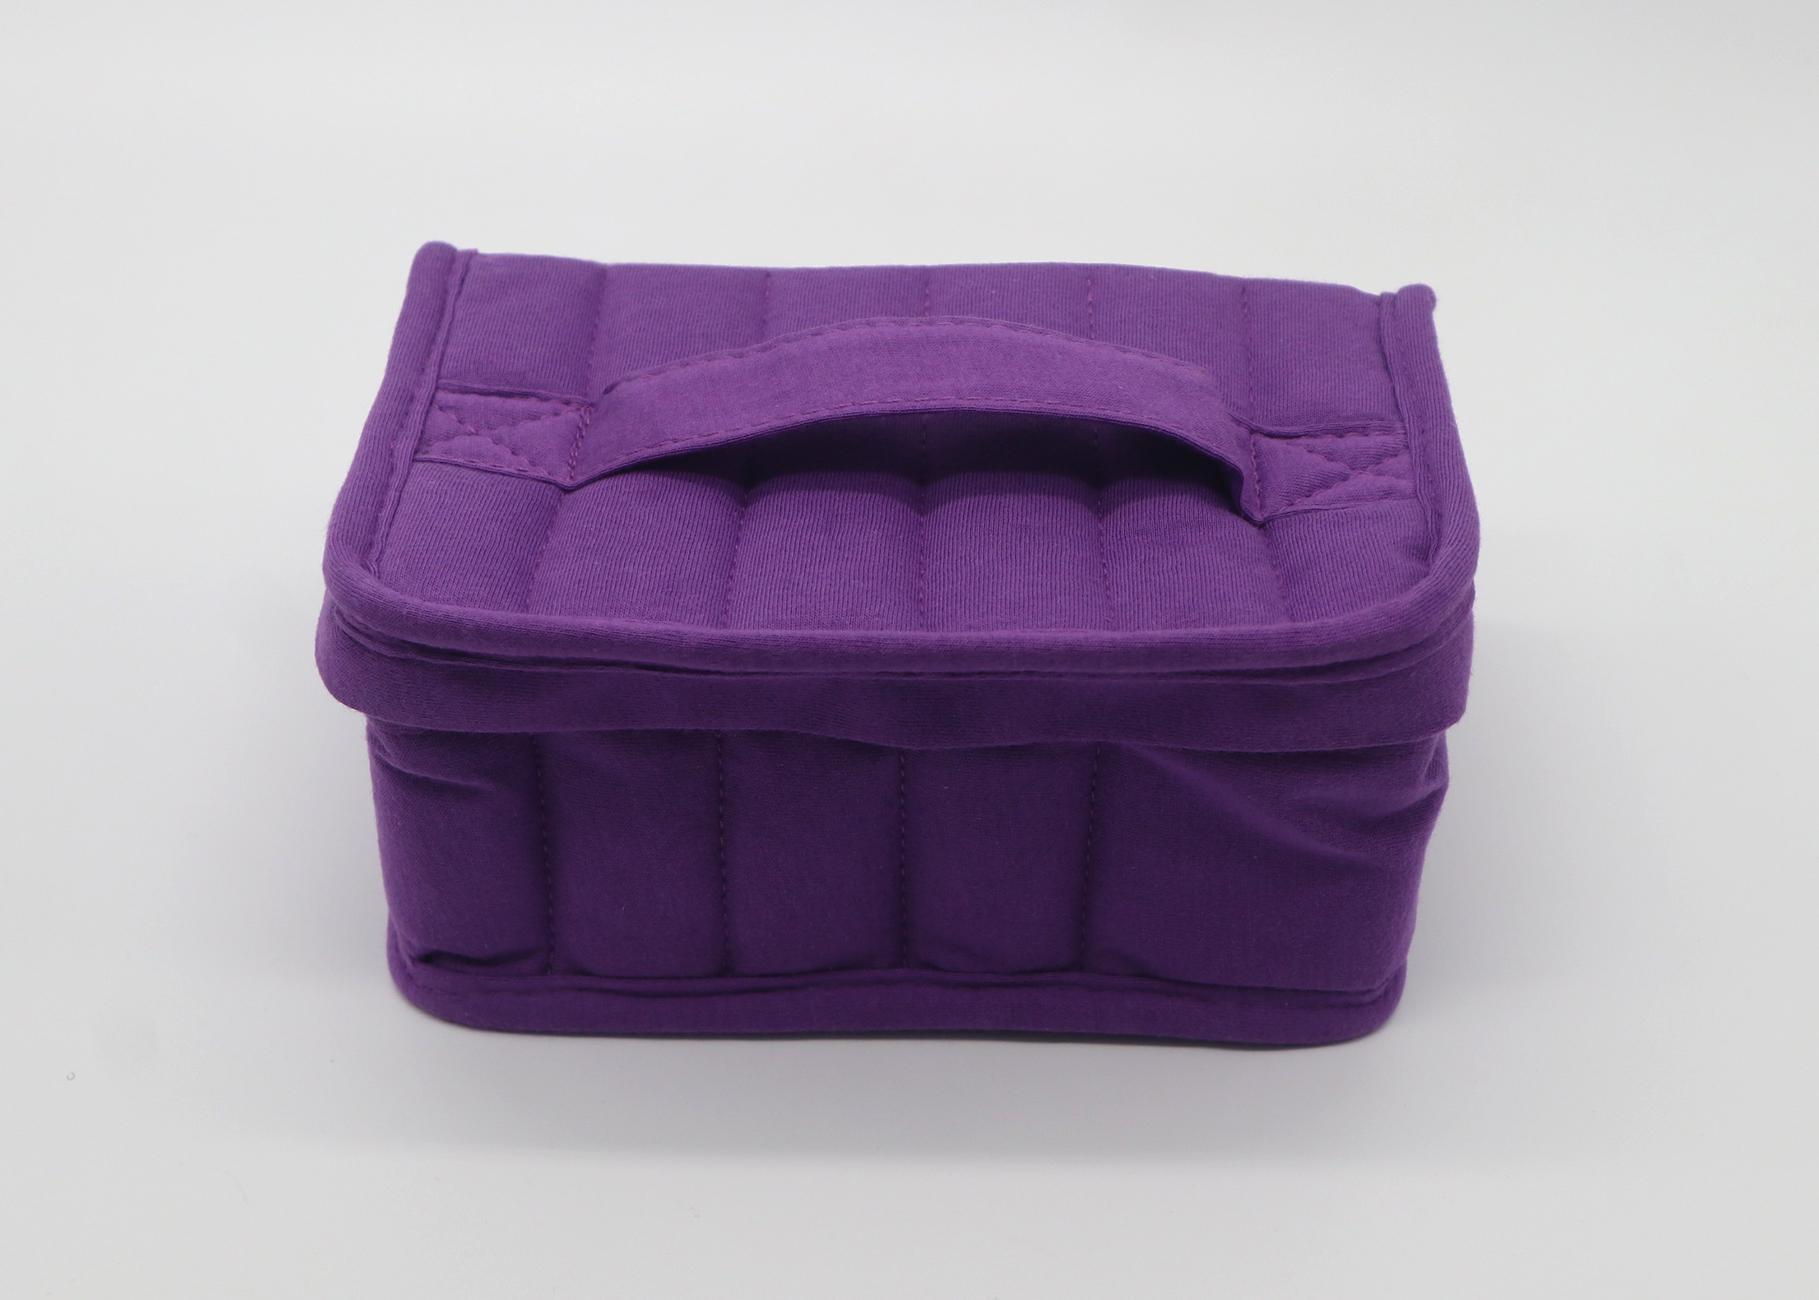 Thirteen bottles holders mutispandex made essential oil pouch bag  6